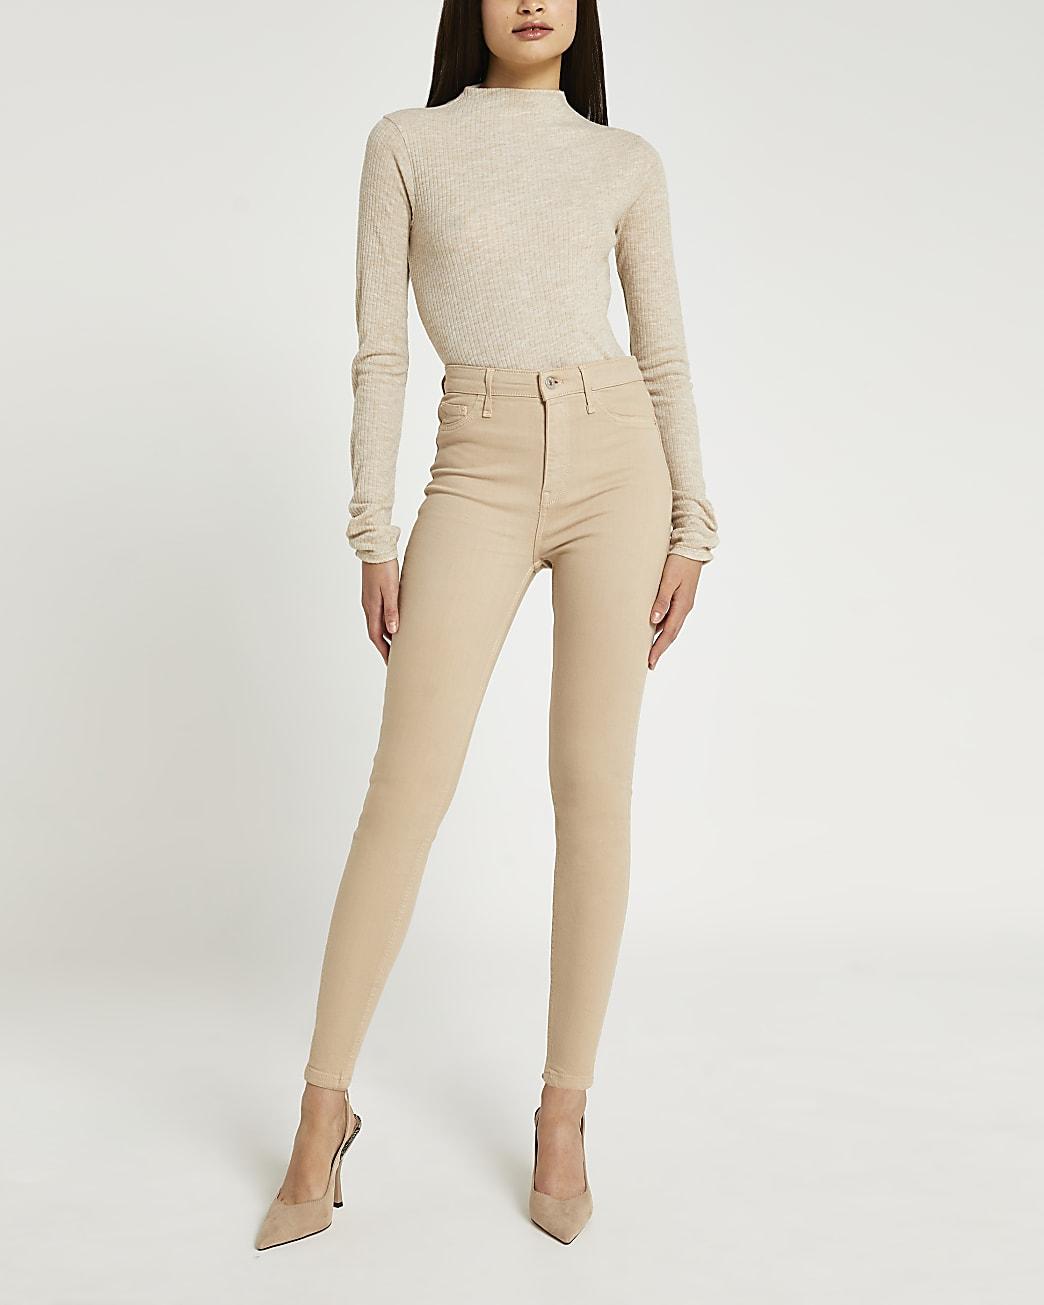 Beige high waisted skinny jeans